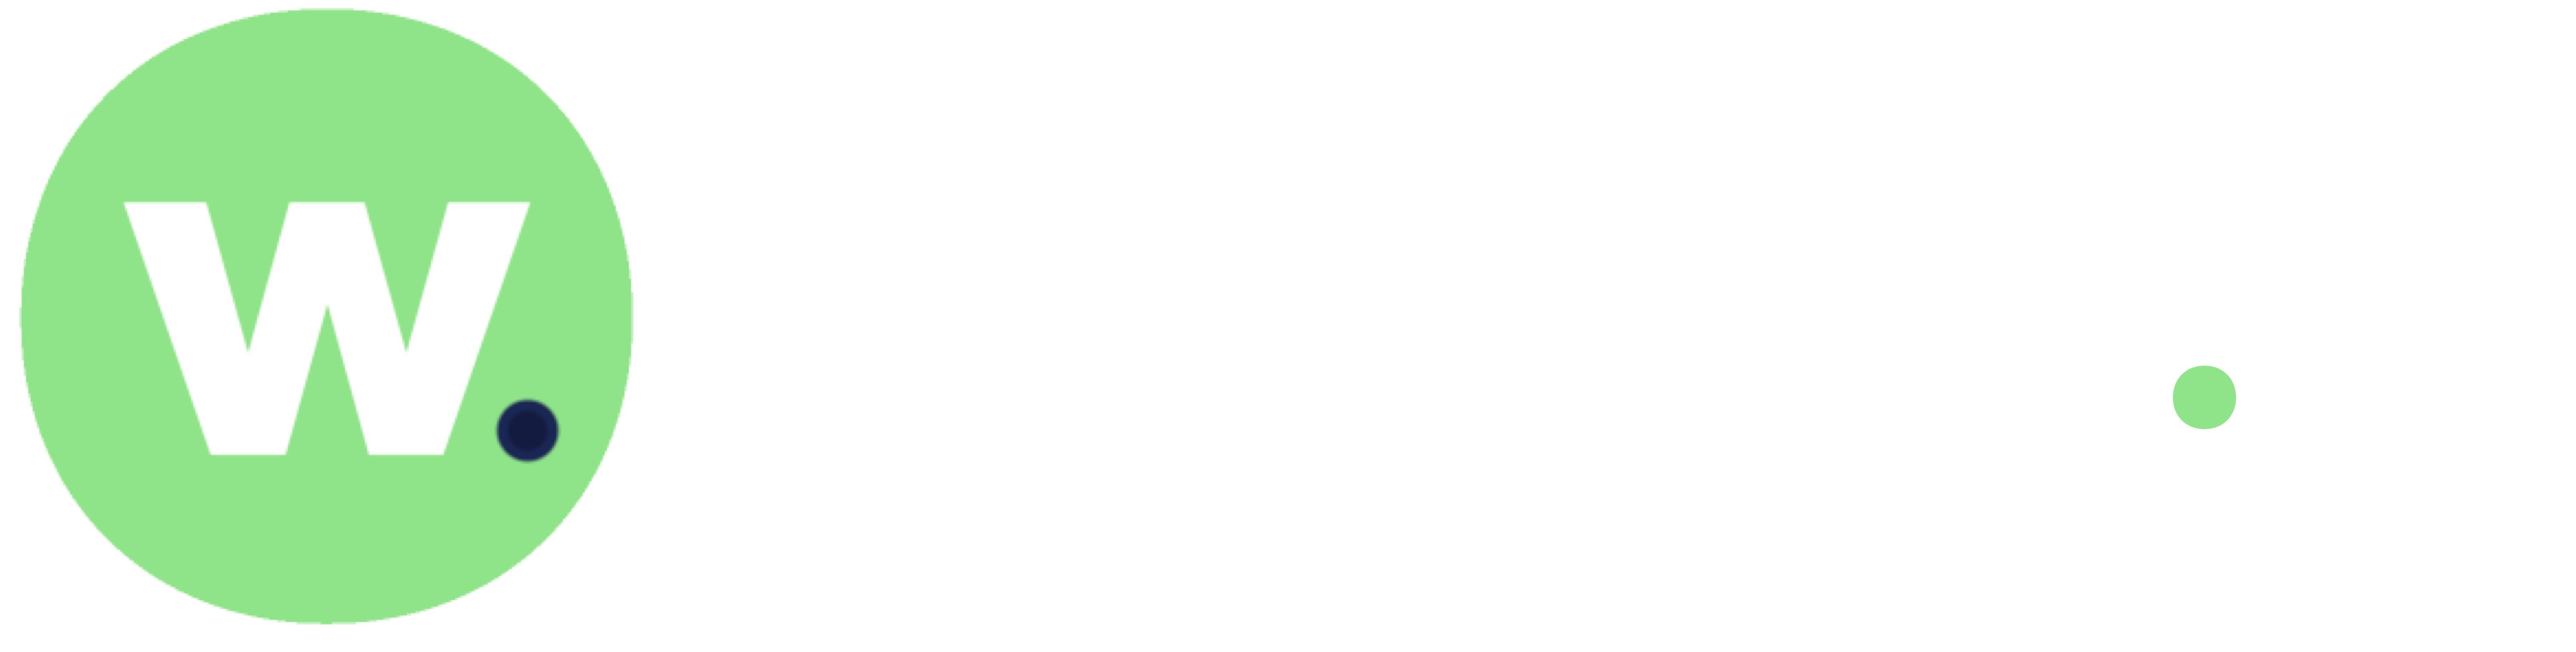 WorkSuite Blog